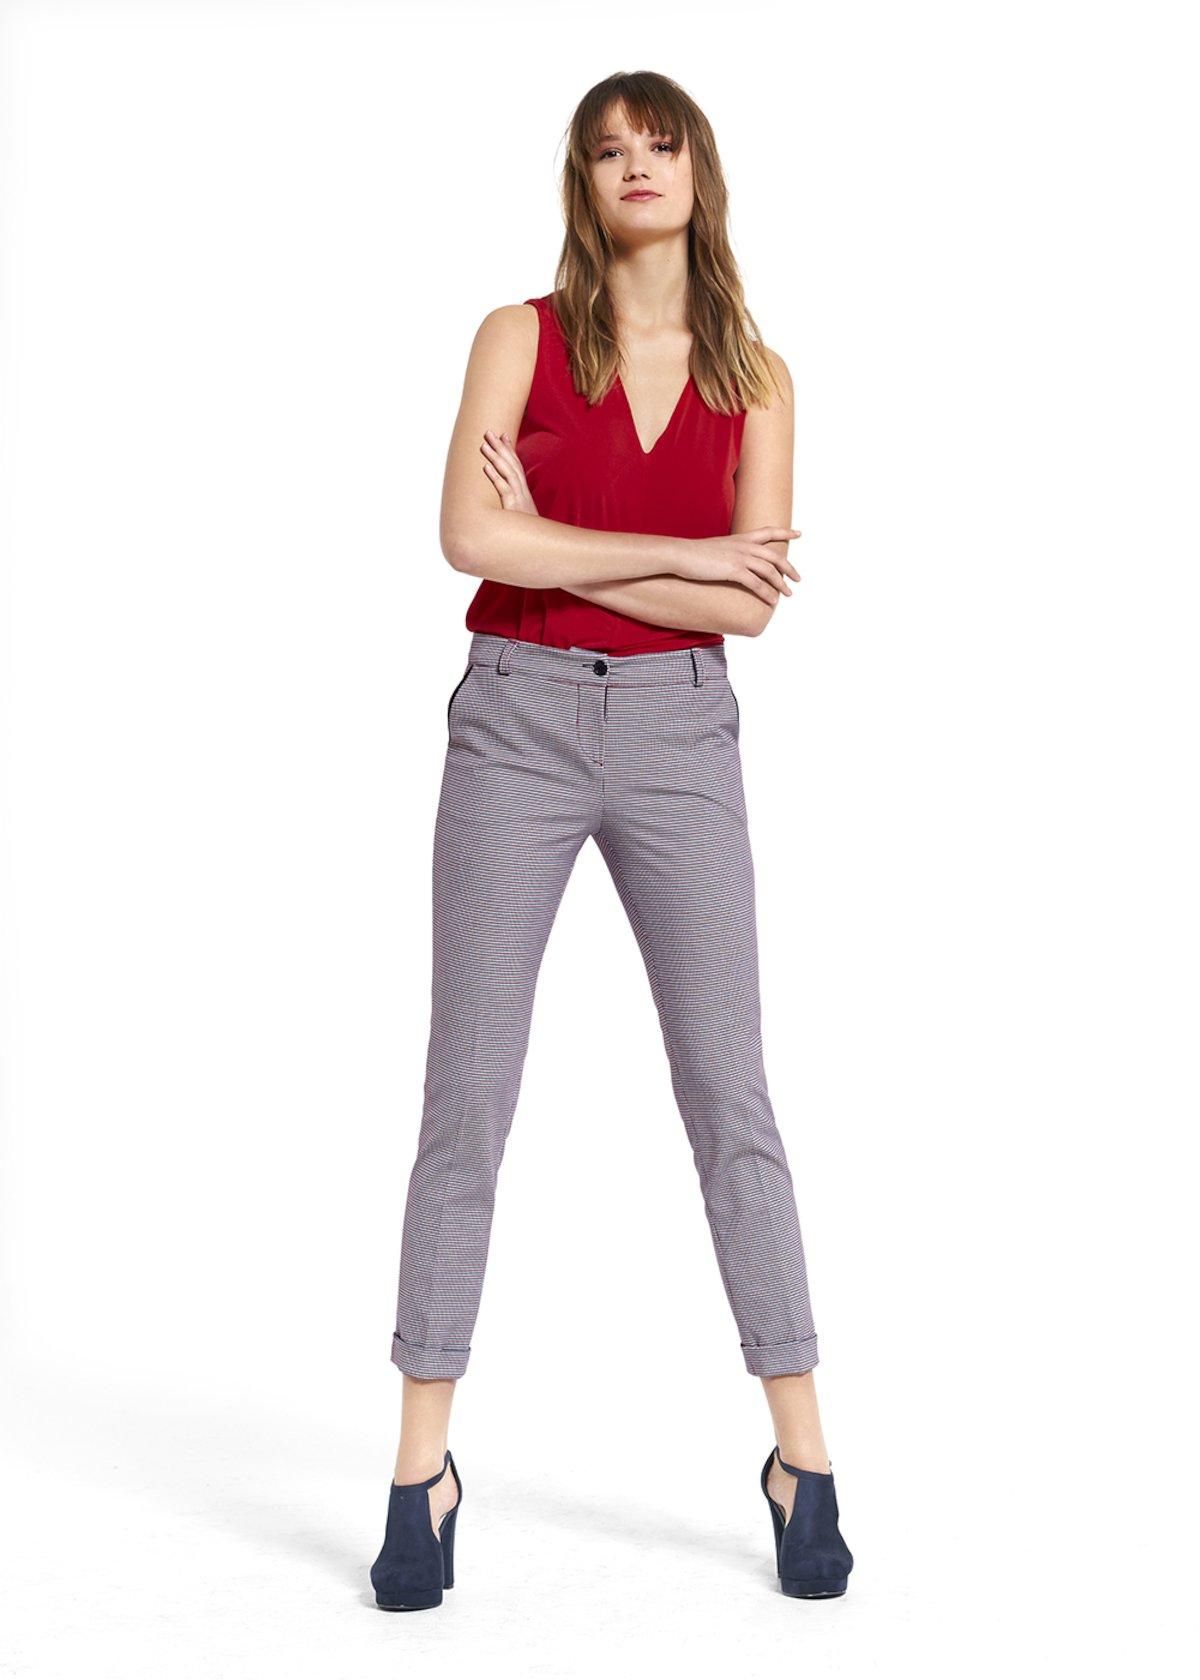 Pantaloni Pilar in tessuto check - Tulipano / Blue Fantasia - Donna